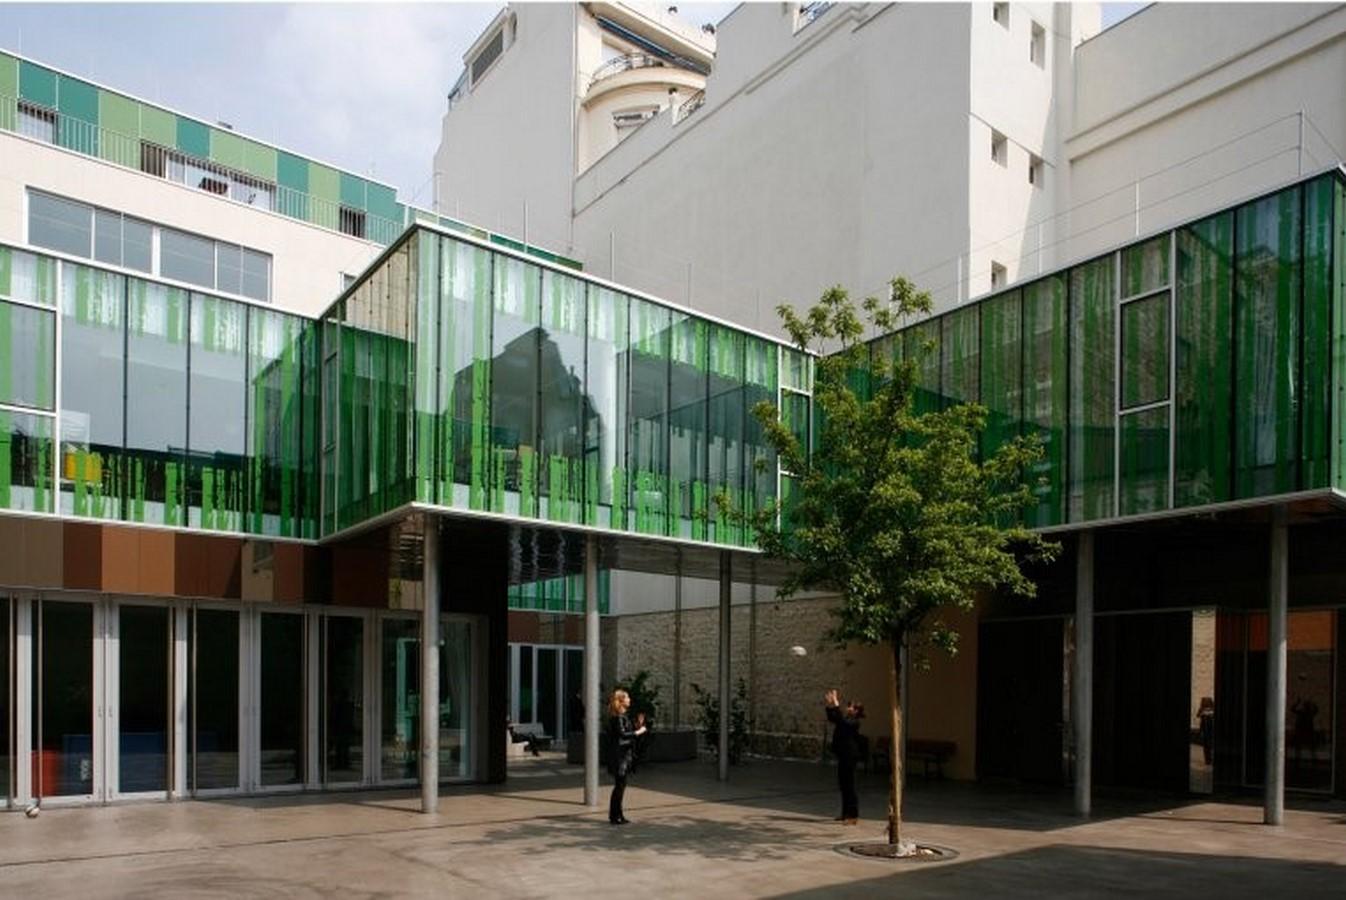 Elementary School, Paris' 9th arrondissement - Sheet1